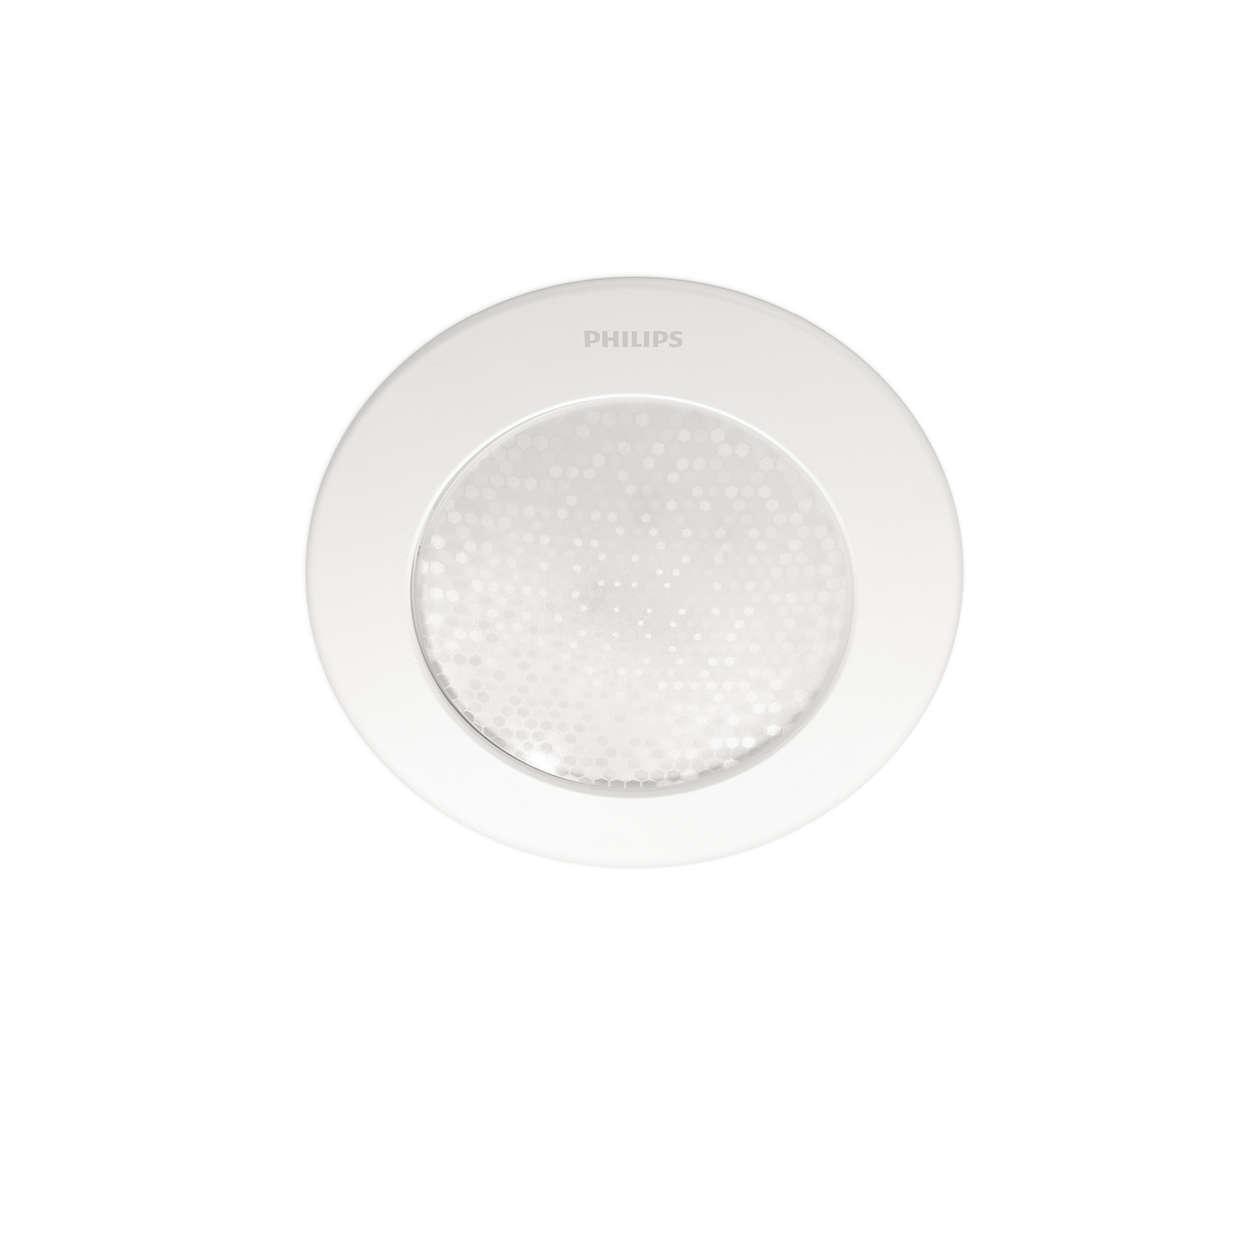 hue personal wireless lighting recessed spot light. Black Bedroom Furniture Sets. Home Design Ideas